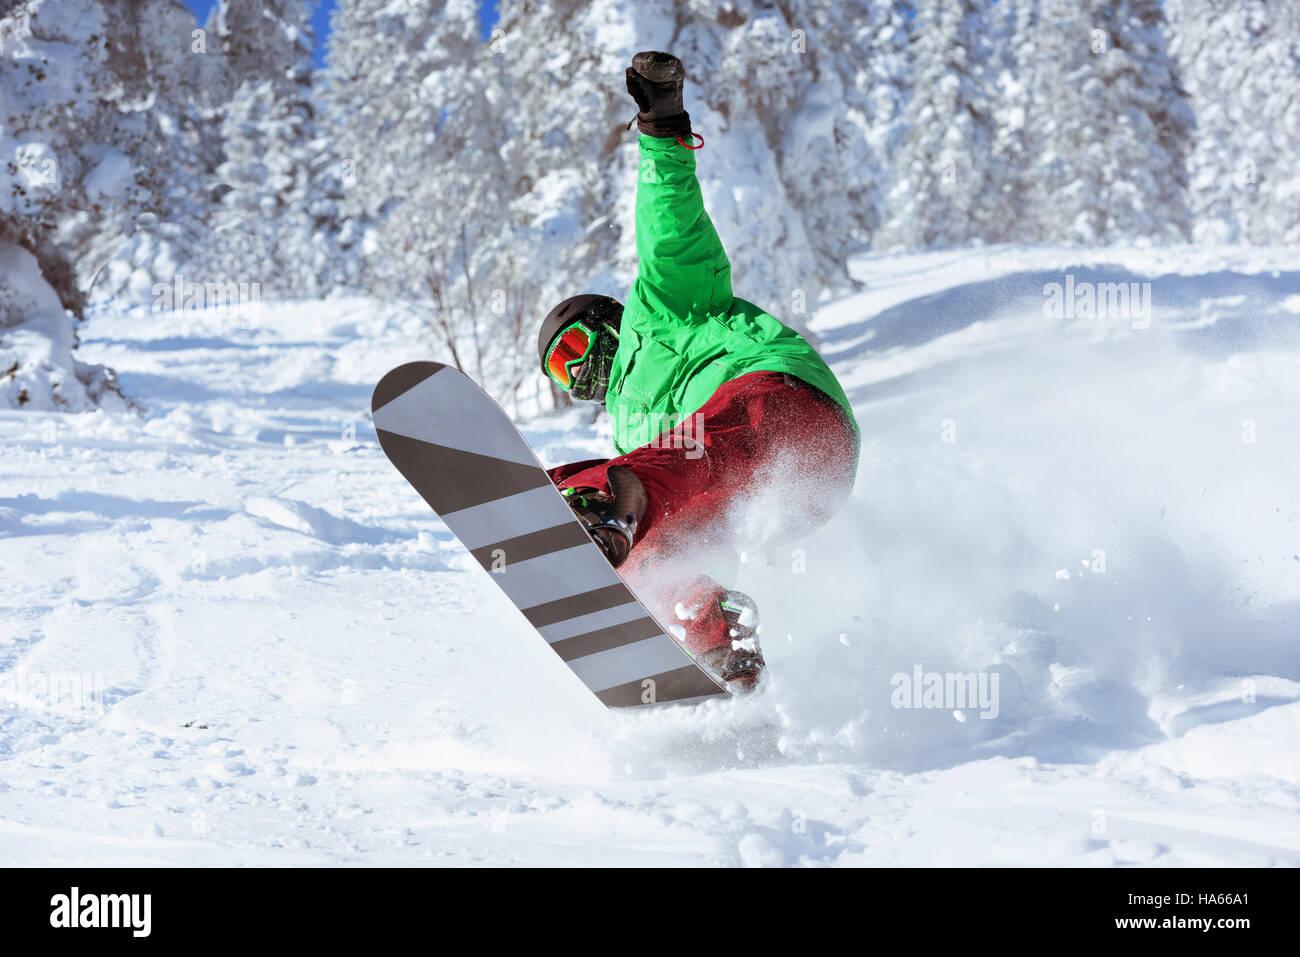 Skifahrer Snowboarder springt Freeride Wald Stockfoto